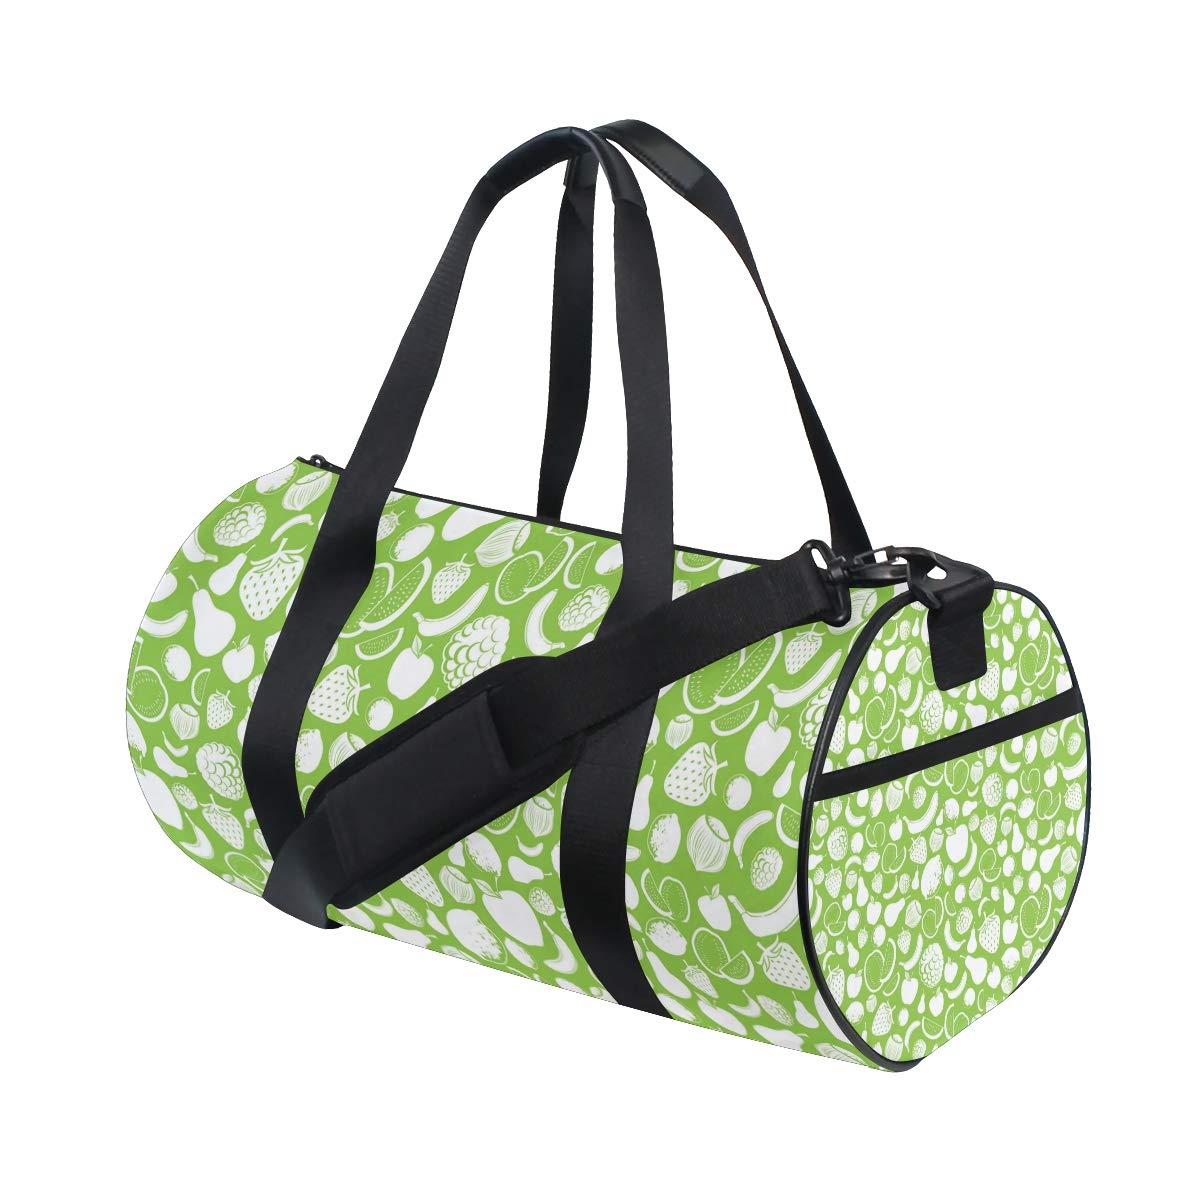 Waterproof Non-Slip Wearable Crossbody Bag fitness bag Shoulder Bag Fruit Cream Picture